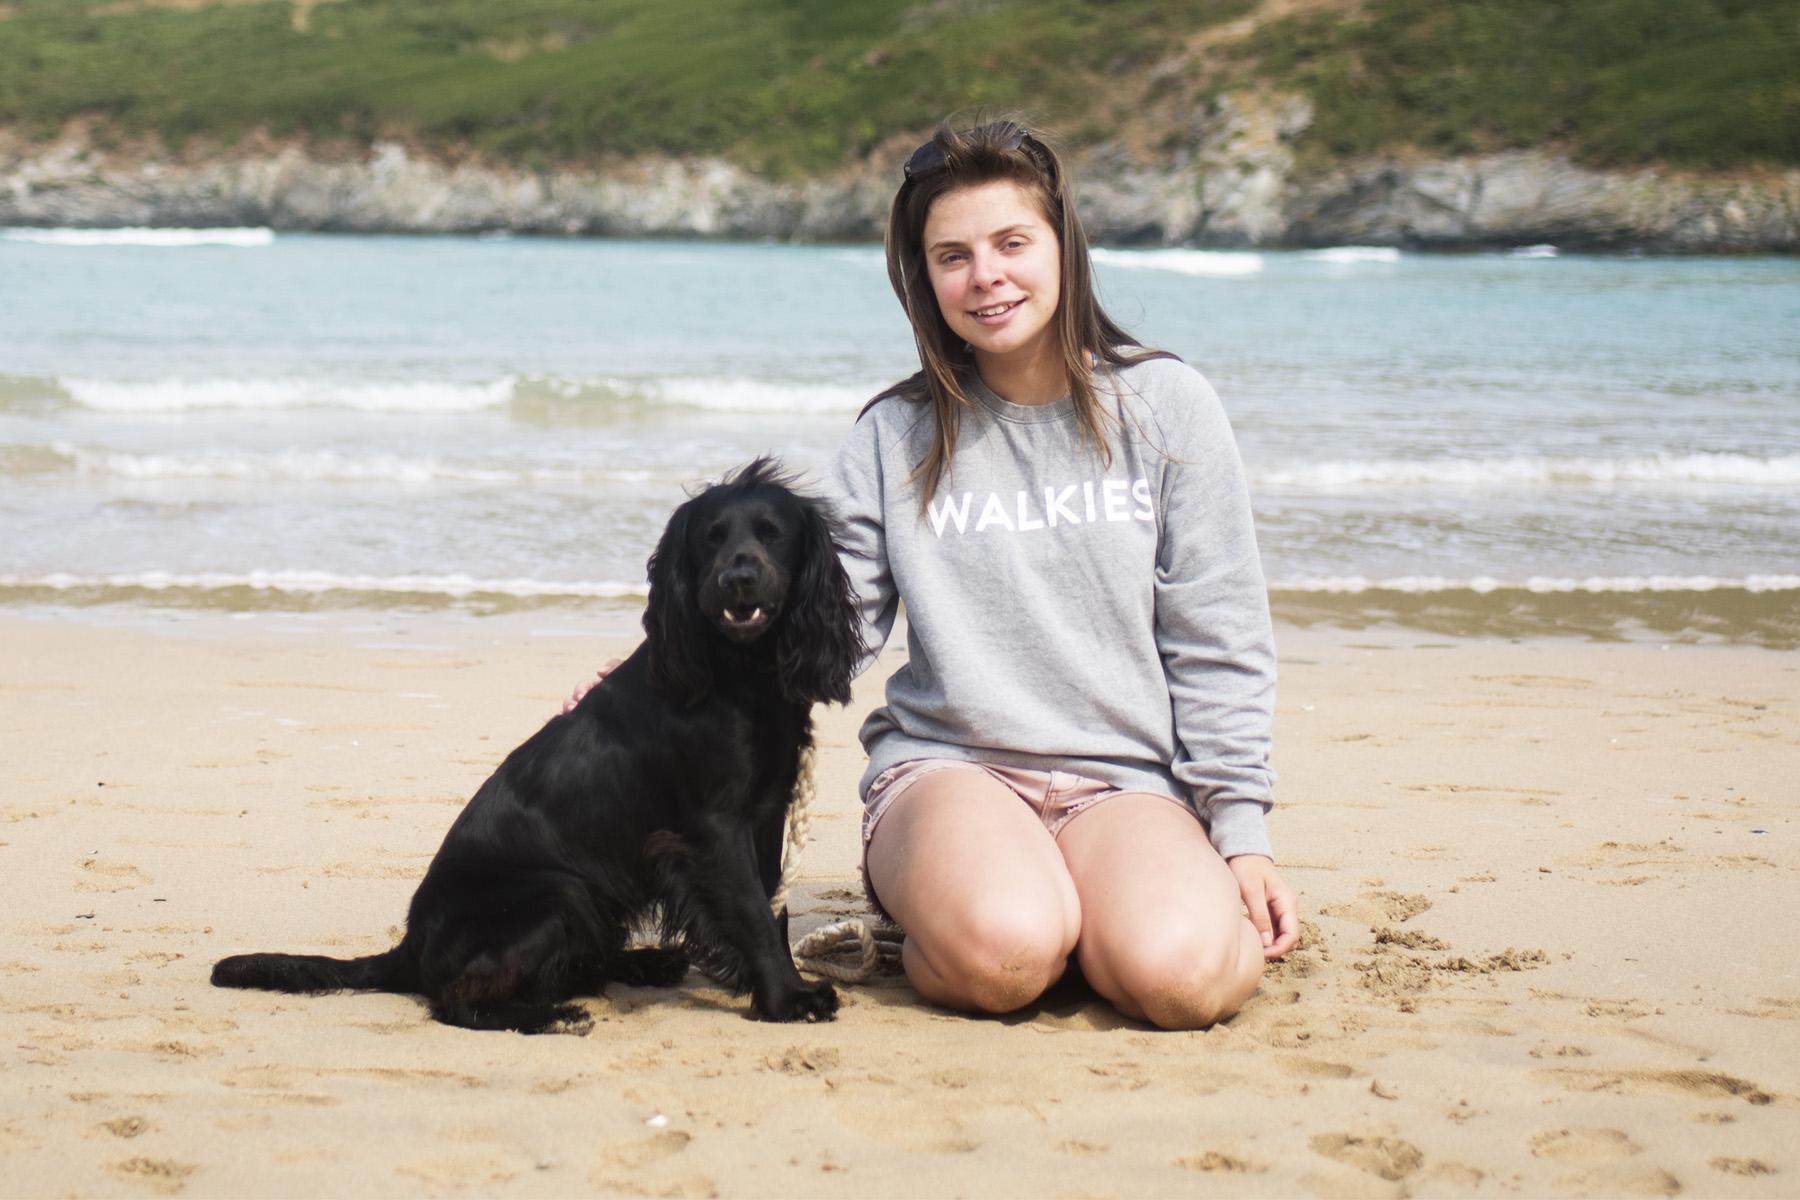 Walkies Sweatshirt   The Cornish Dog